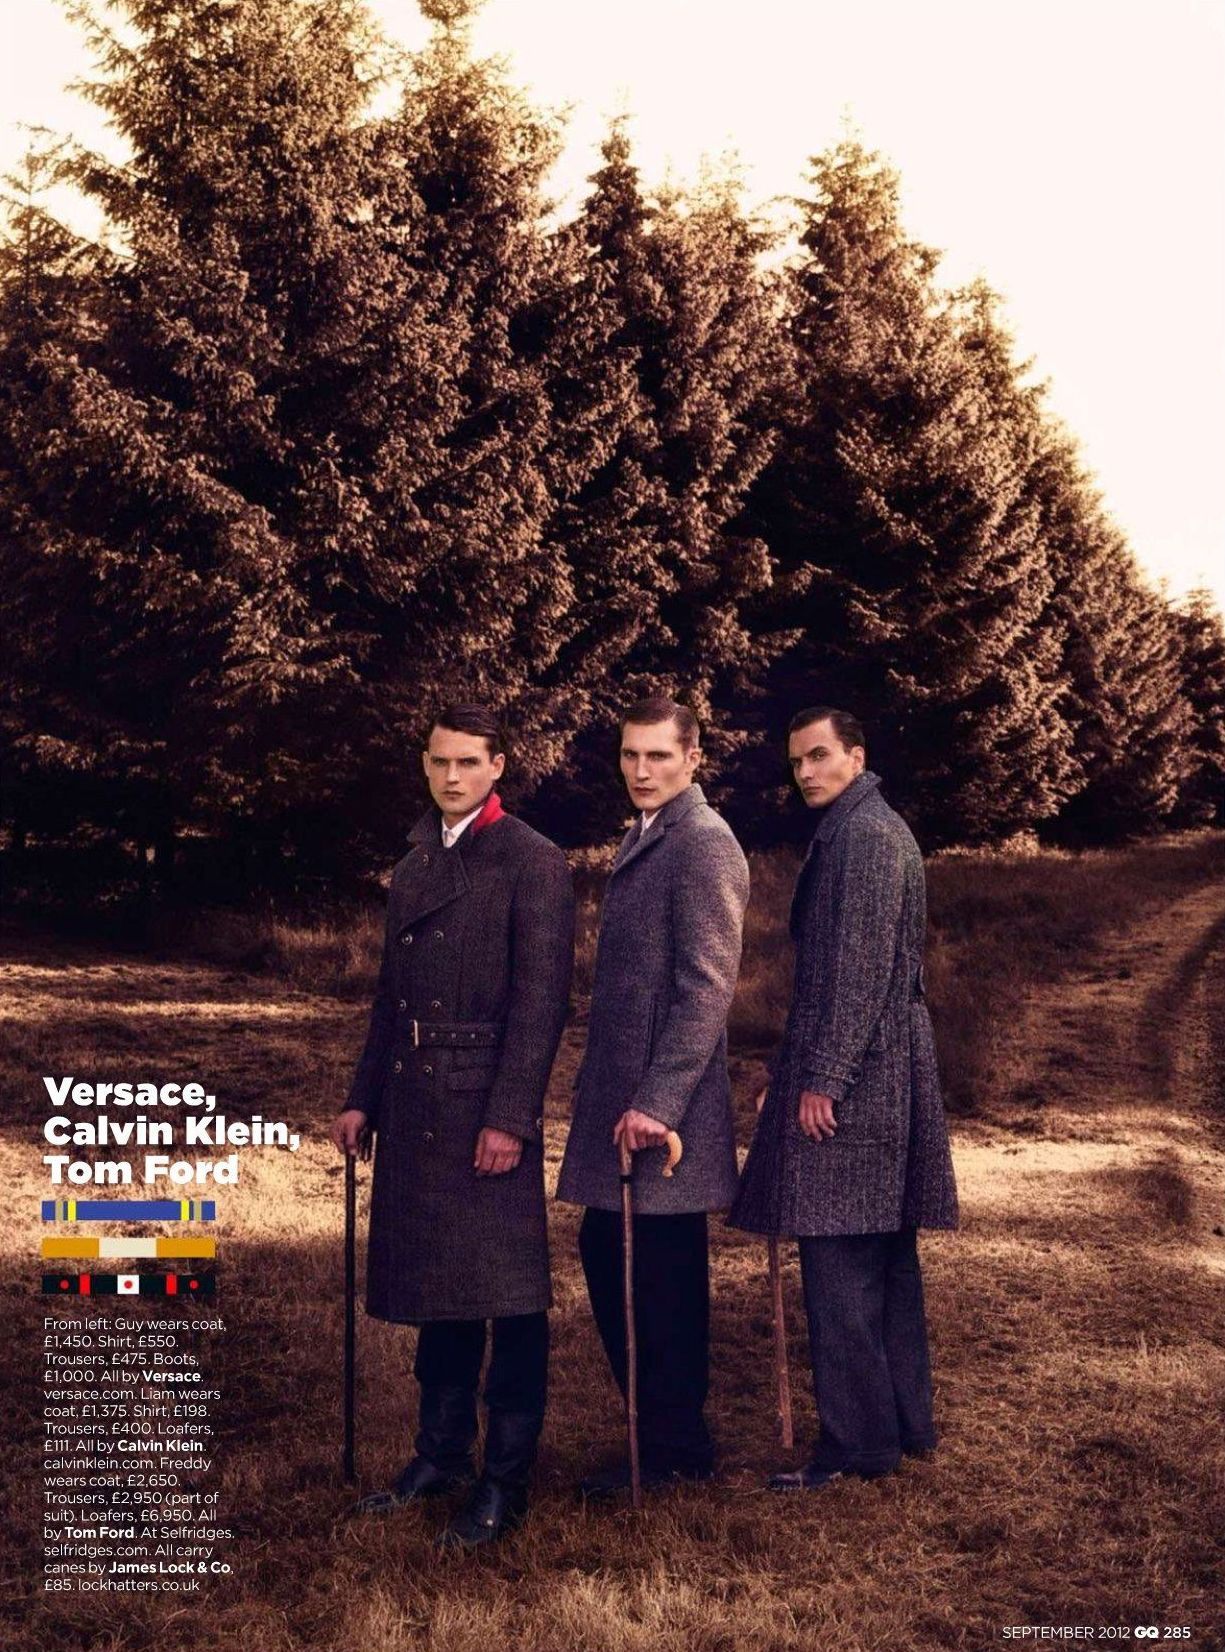 Guy Robinson, Nick Wilson, Fionn MacDiarmid & Others Model Fall/Winter 2012 Designs for British GQ